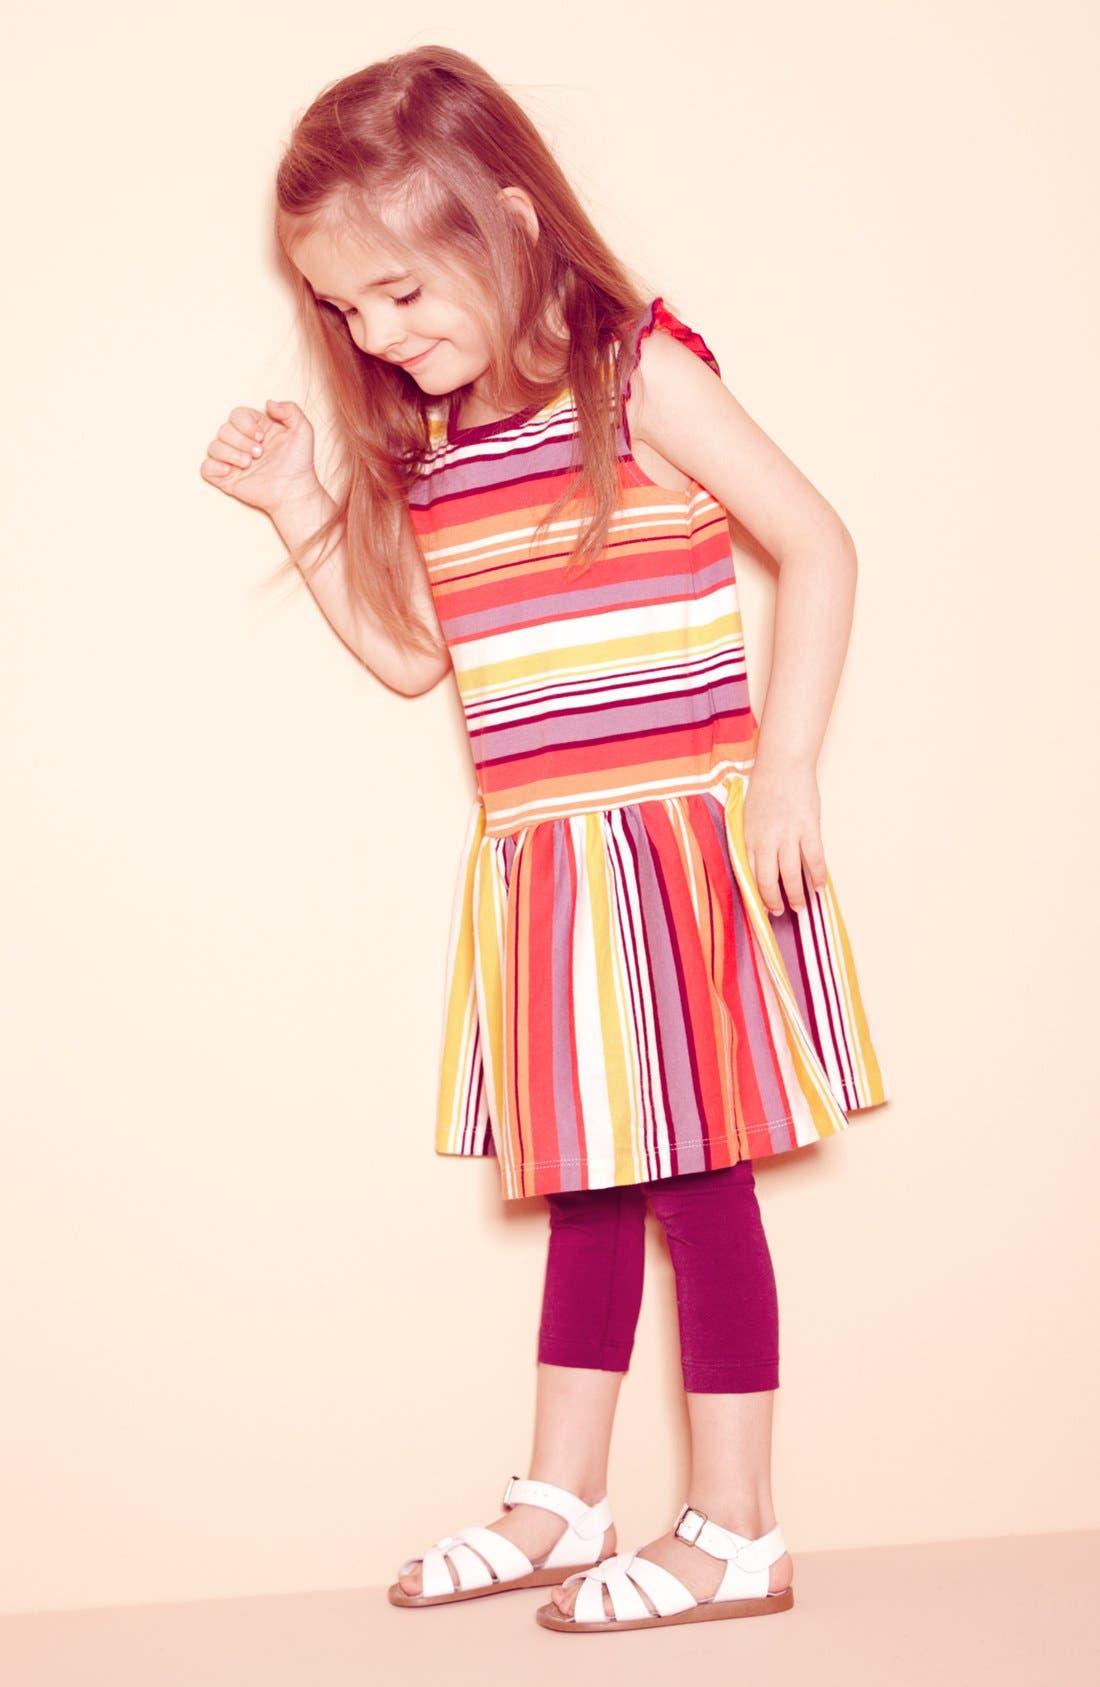 Main Image - Tea Collection Dress & Leggings & Hoy Shoe Sandal (Toddler)